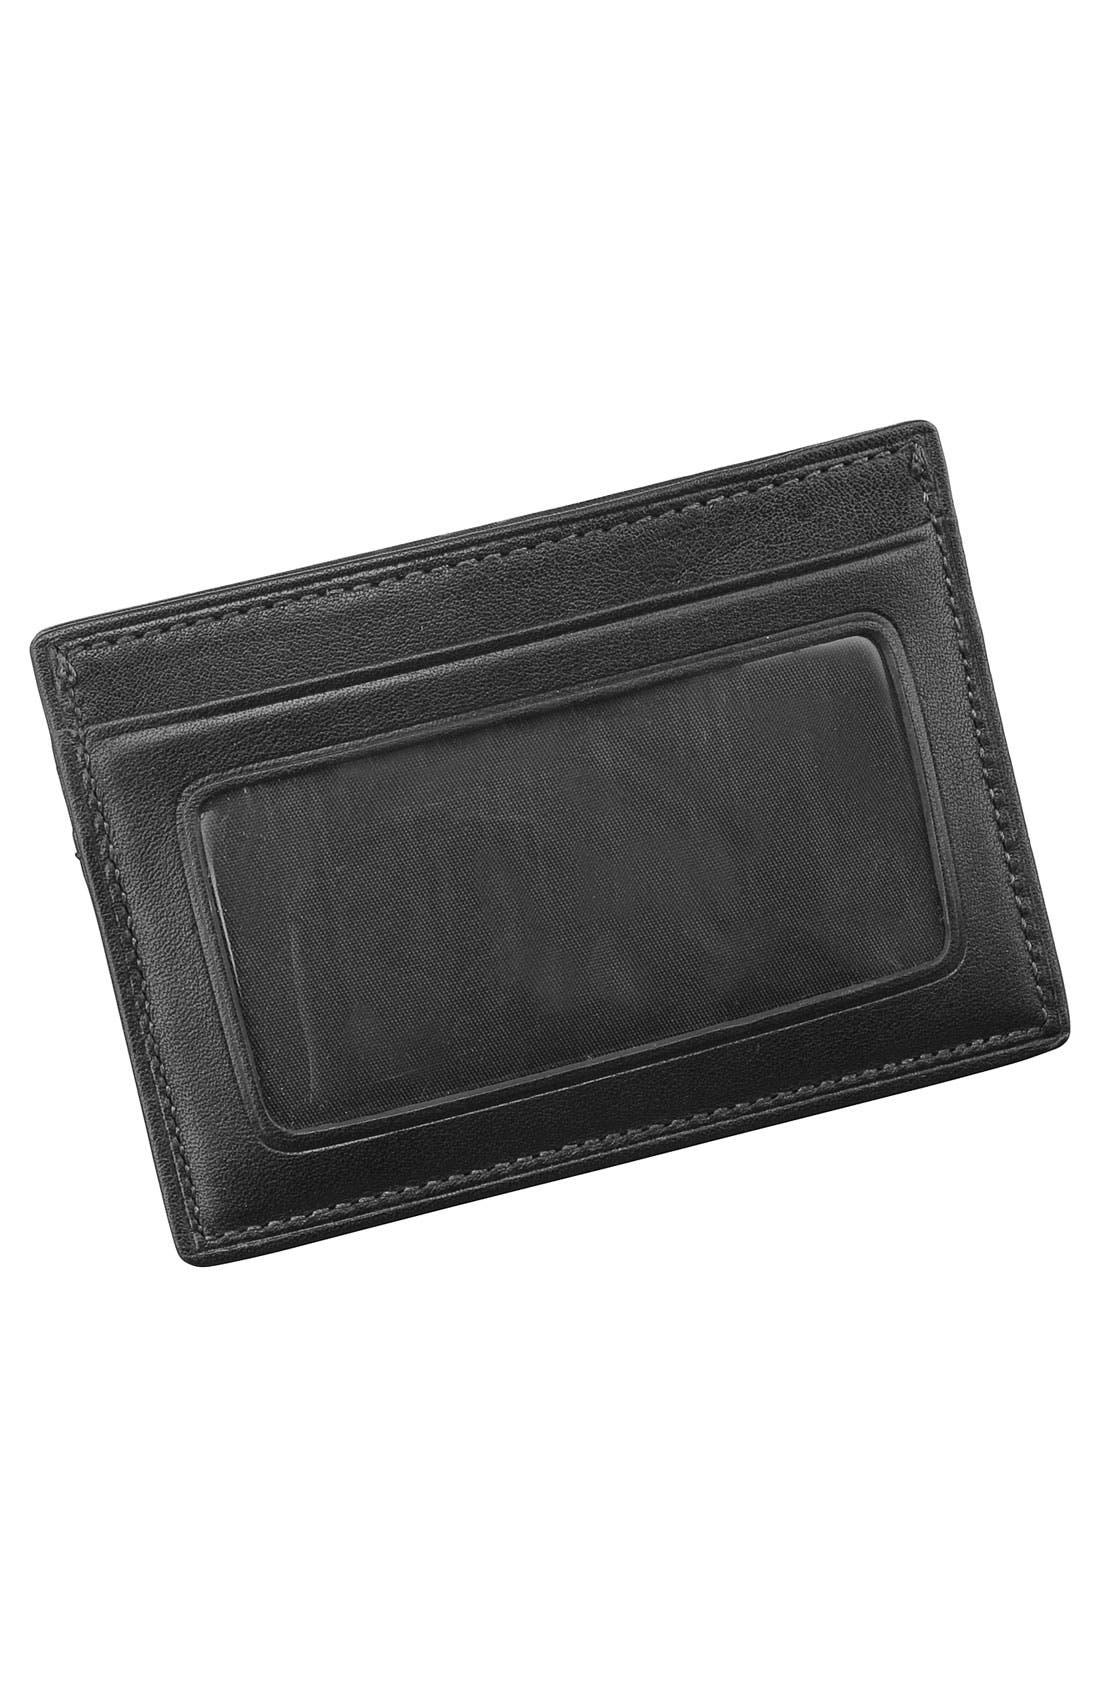 Alternate Image 3  - Tumi 'Delta' Slim Card Case ID Wallet